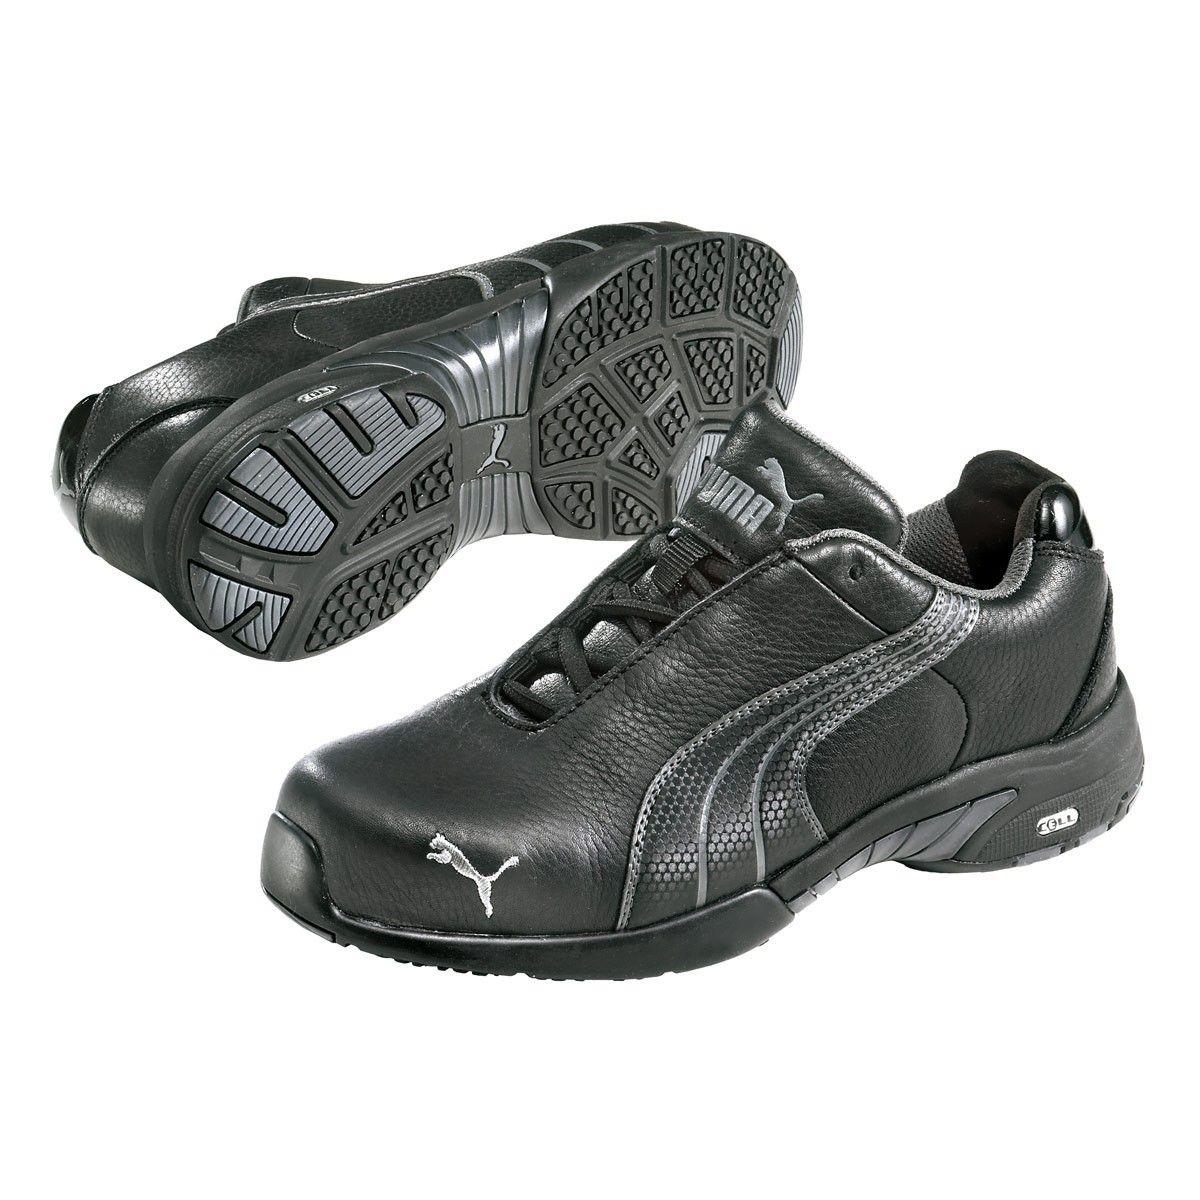 Puma Safety Women's Velocity Shoe